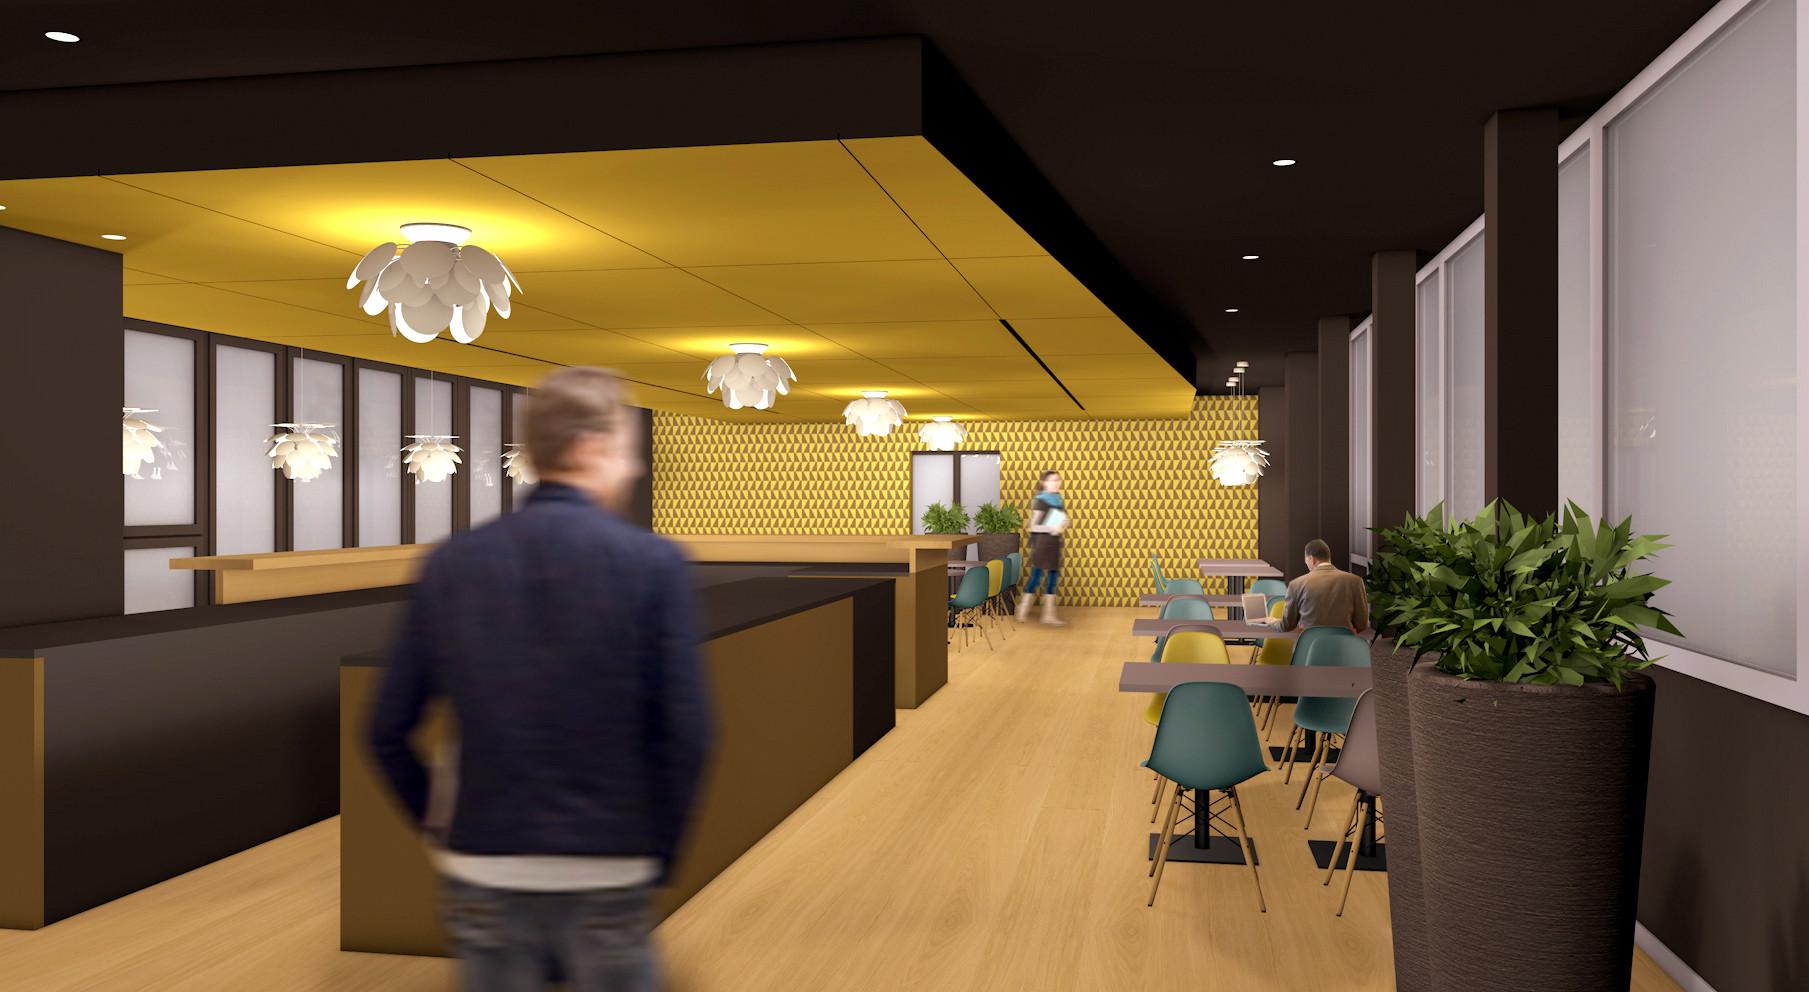 Barmade Innenarchitektur - Planungsphase Restaurant Battenberg